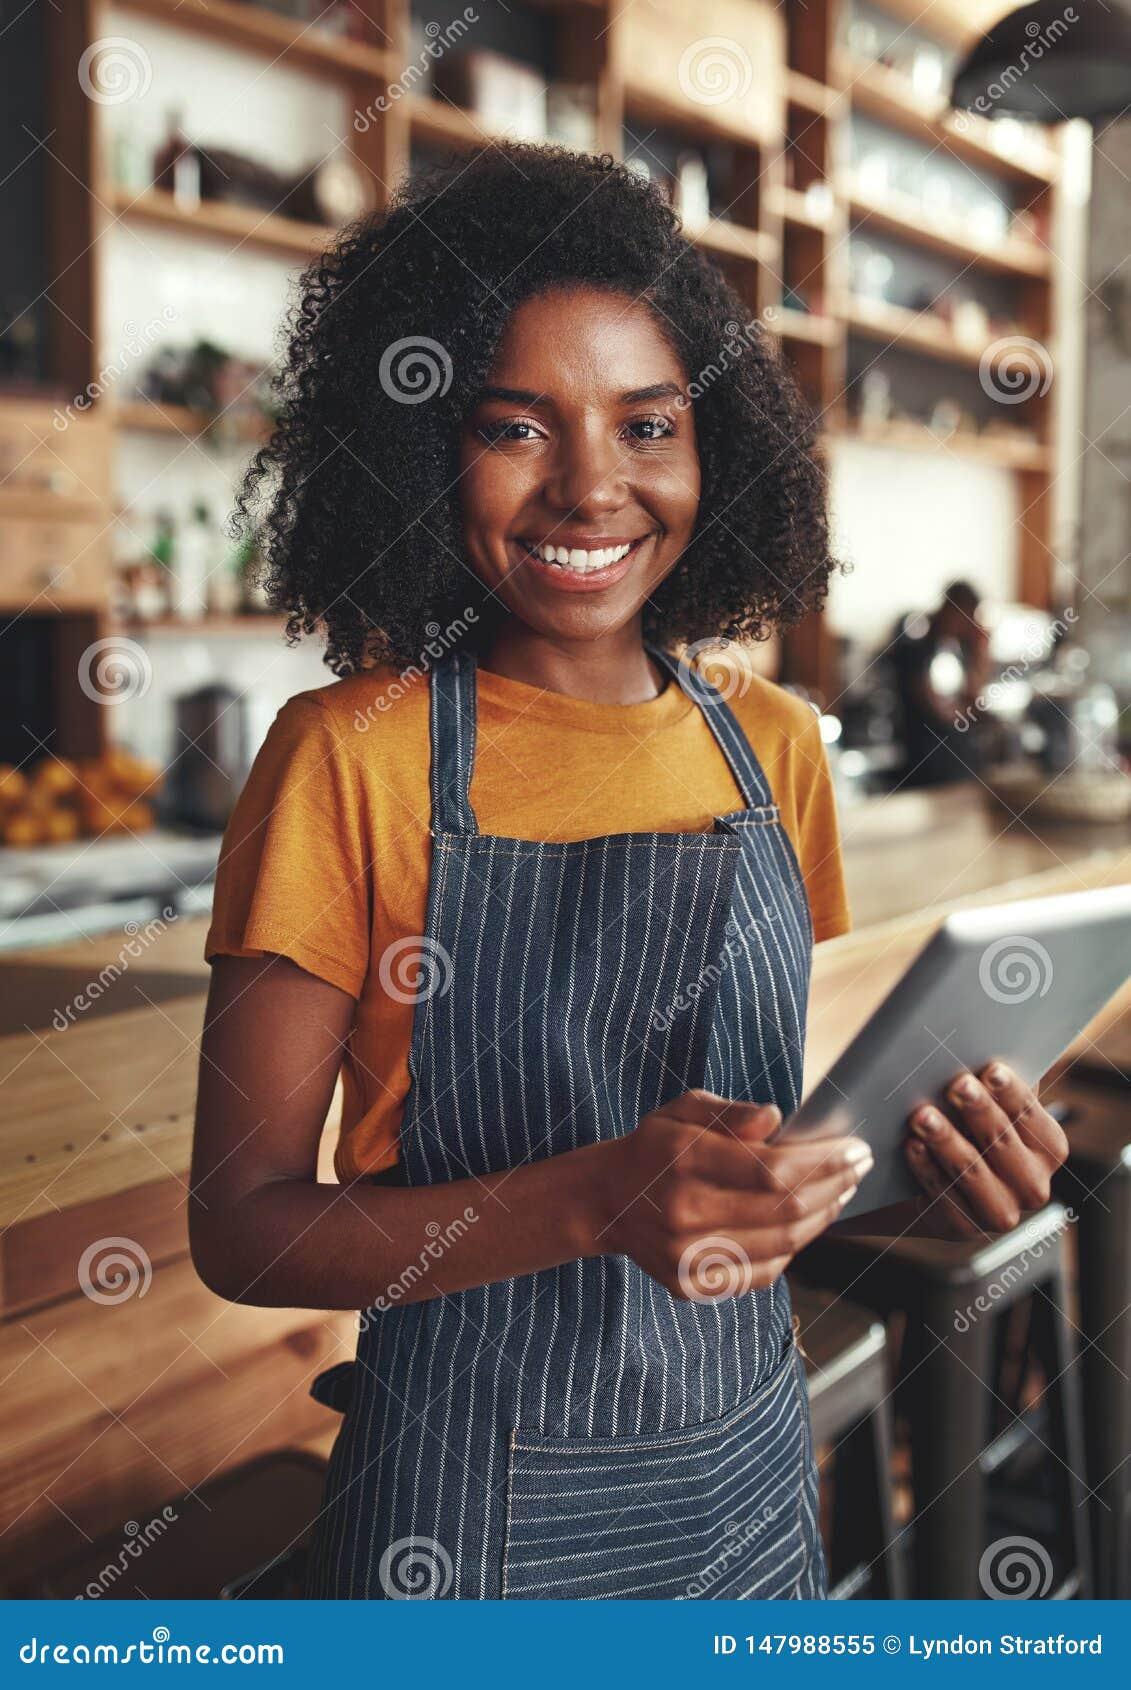 Smiling portrait of a female owner holding digital tablet in her